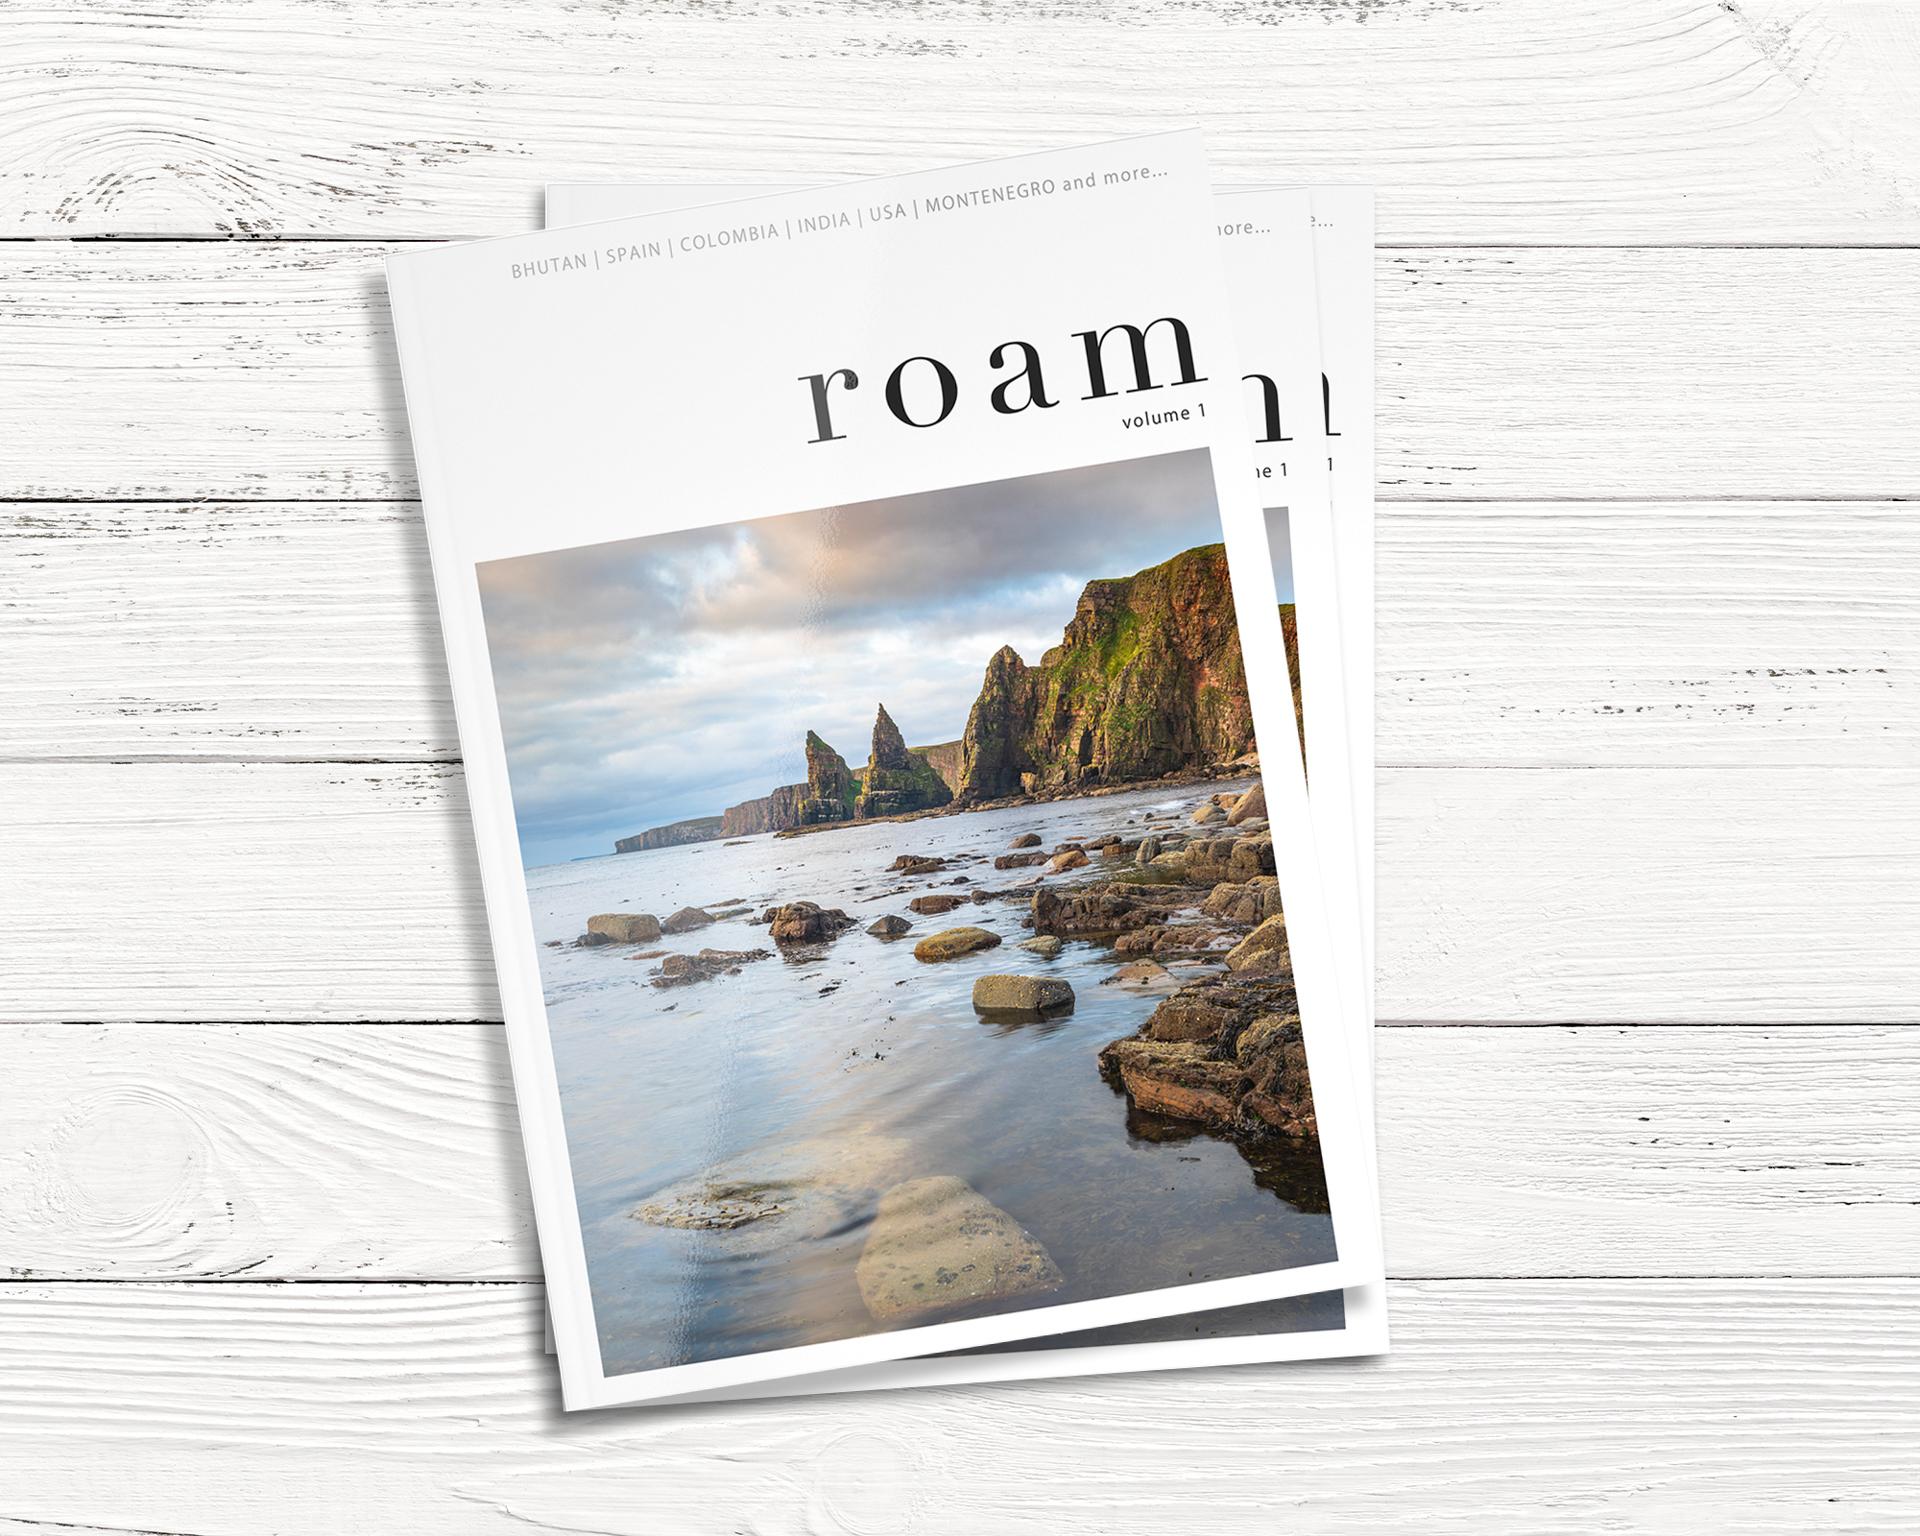 roam travel magazine against a wooden background